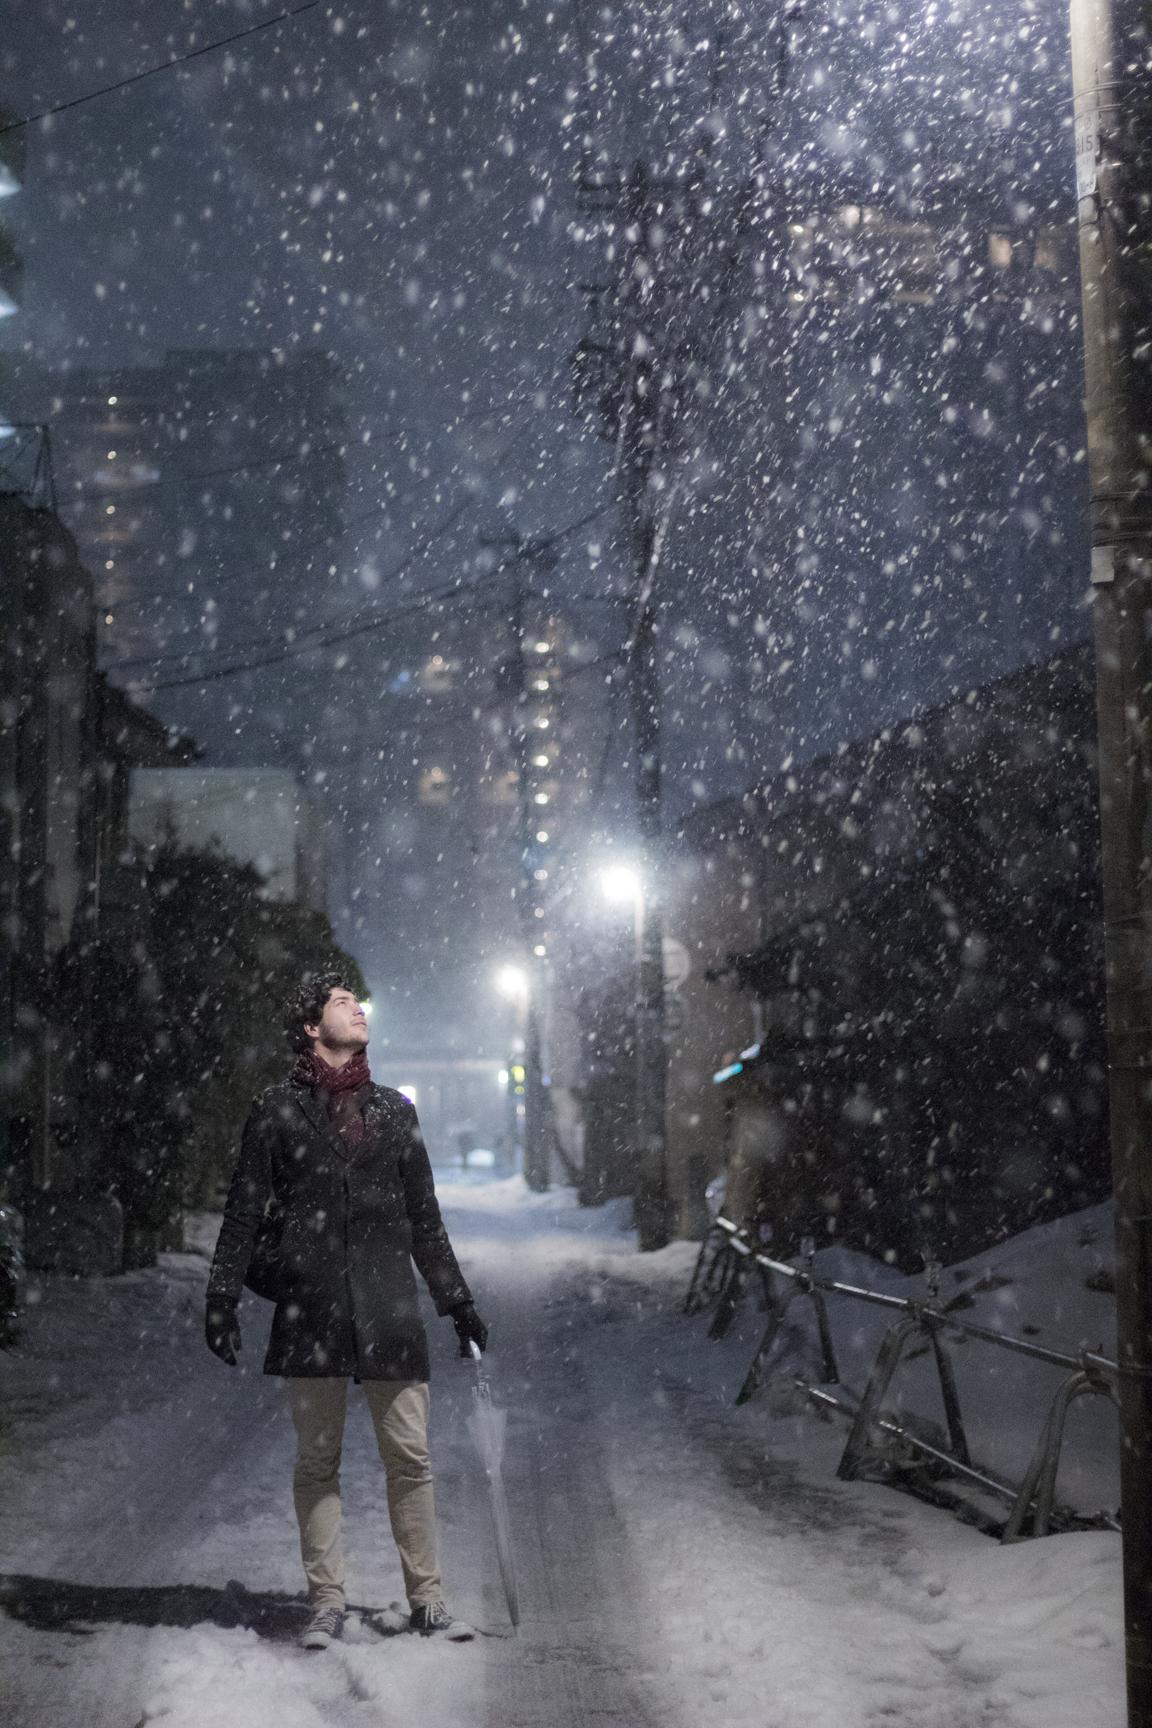 Winter in Kanazawa